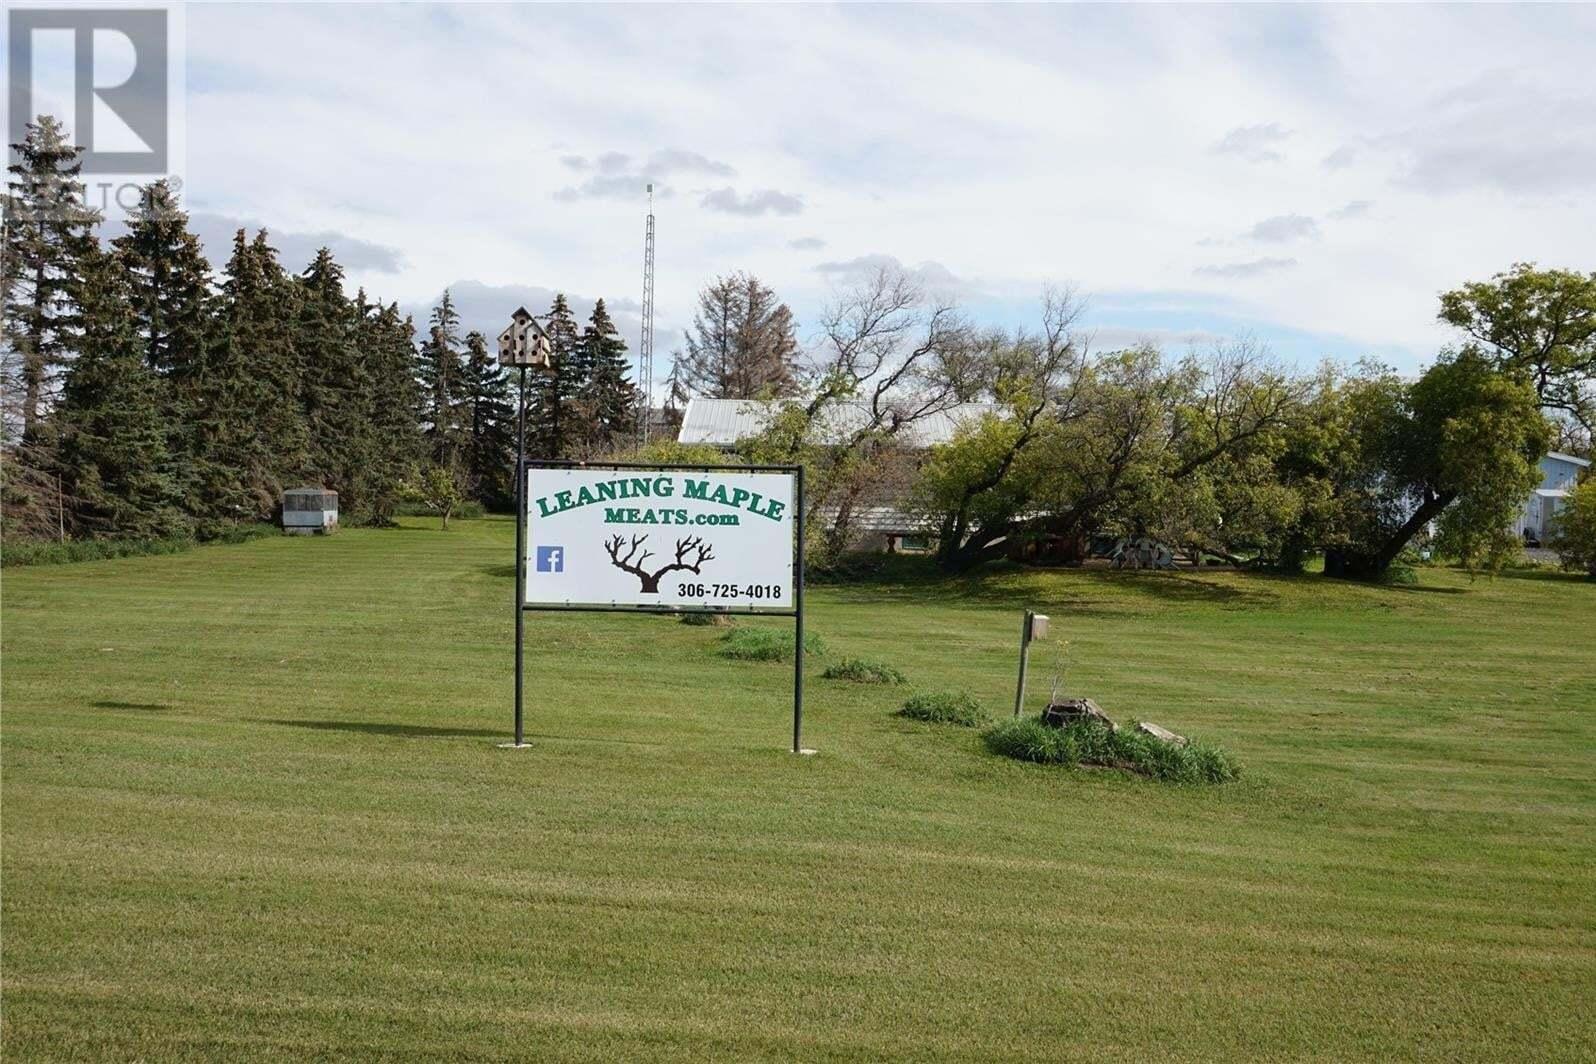 Residential property for sale at 1 Leaning Maple Rd Strasbourg Saskatchewan - MLS: SK810574